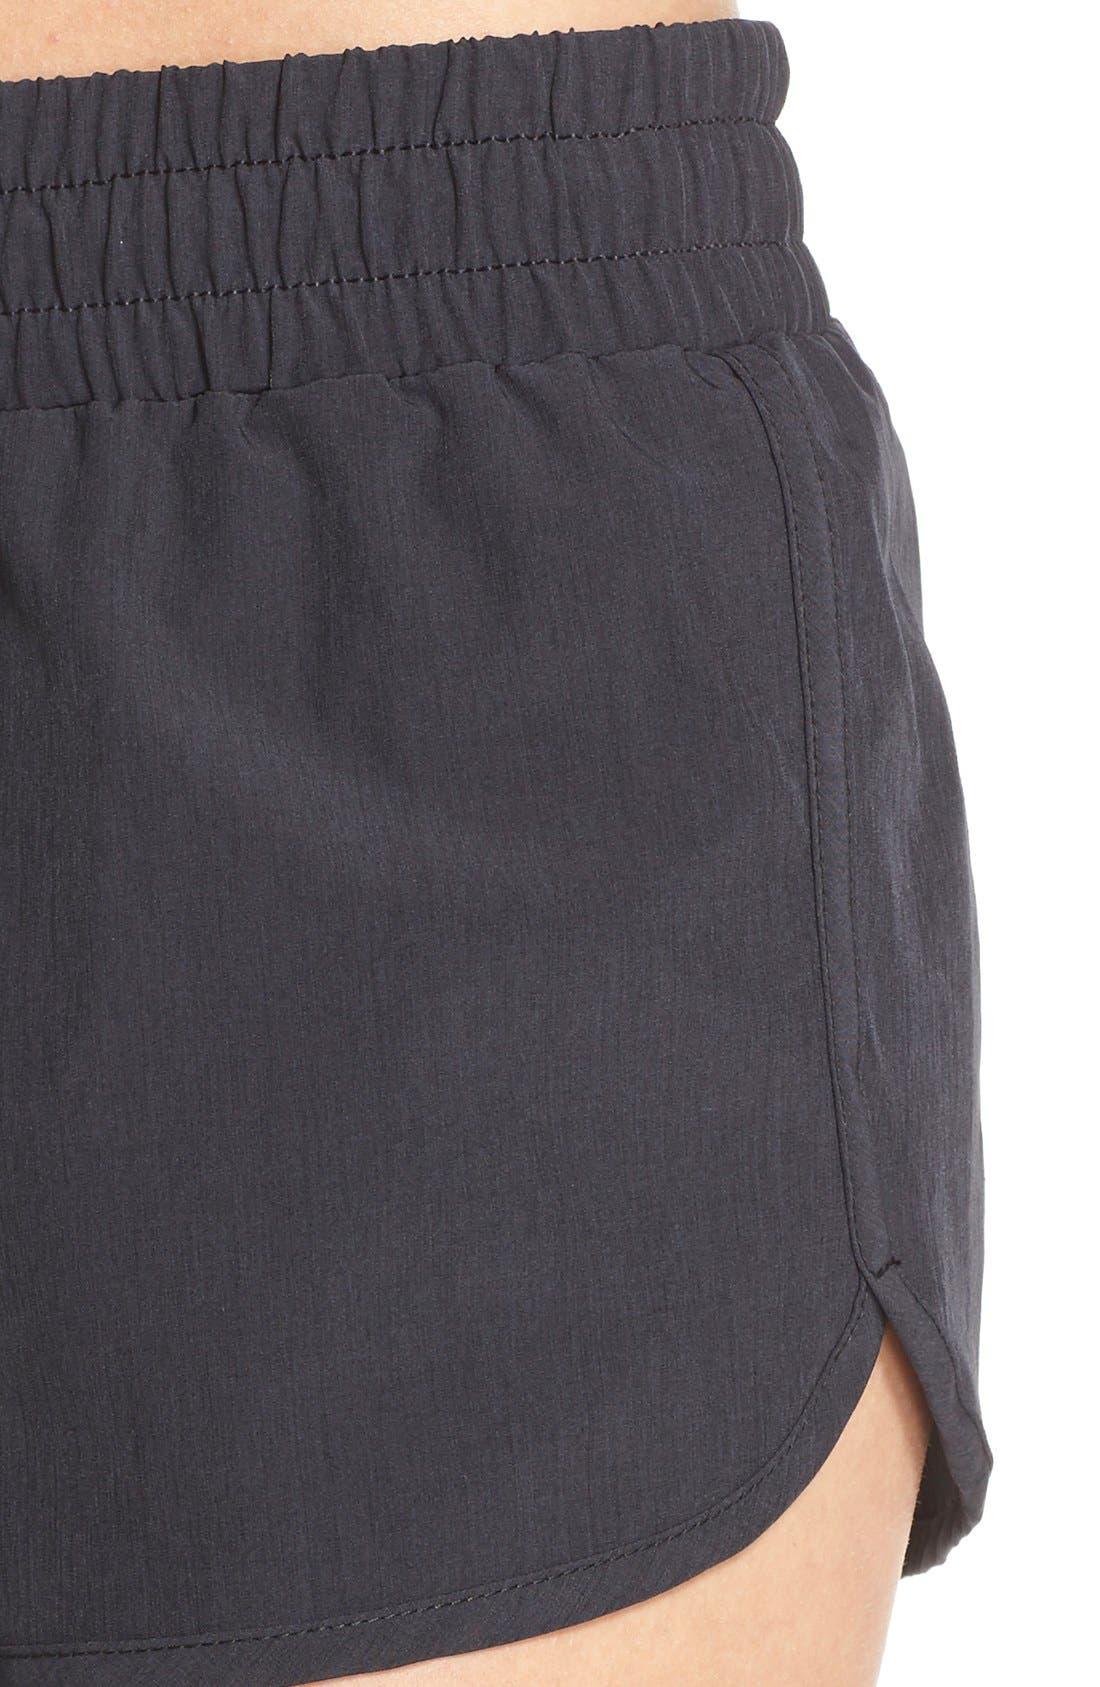 Alternate Image 4  - Zella 'Block & Roll' Board Shorts